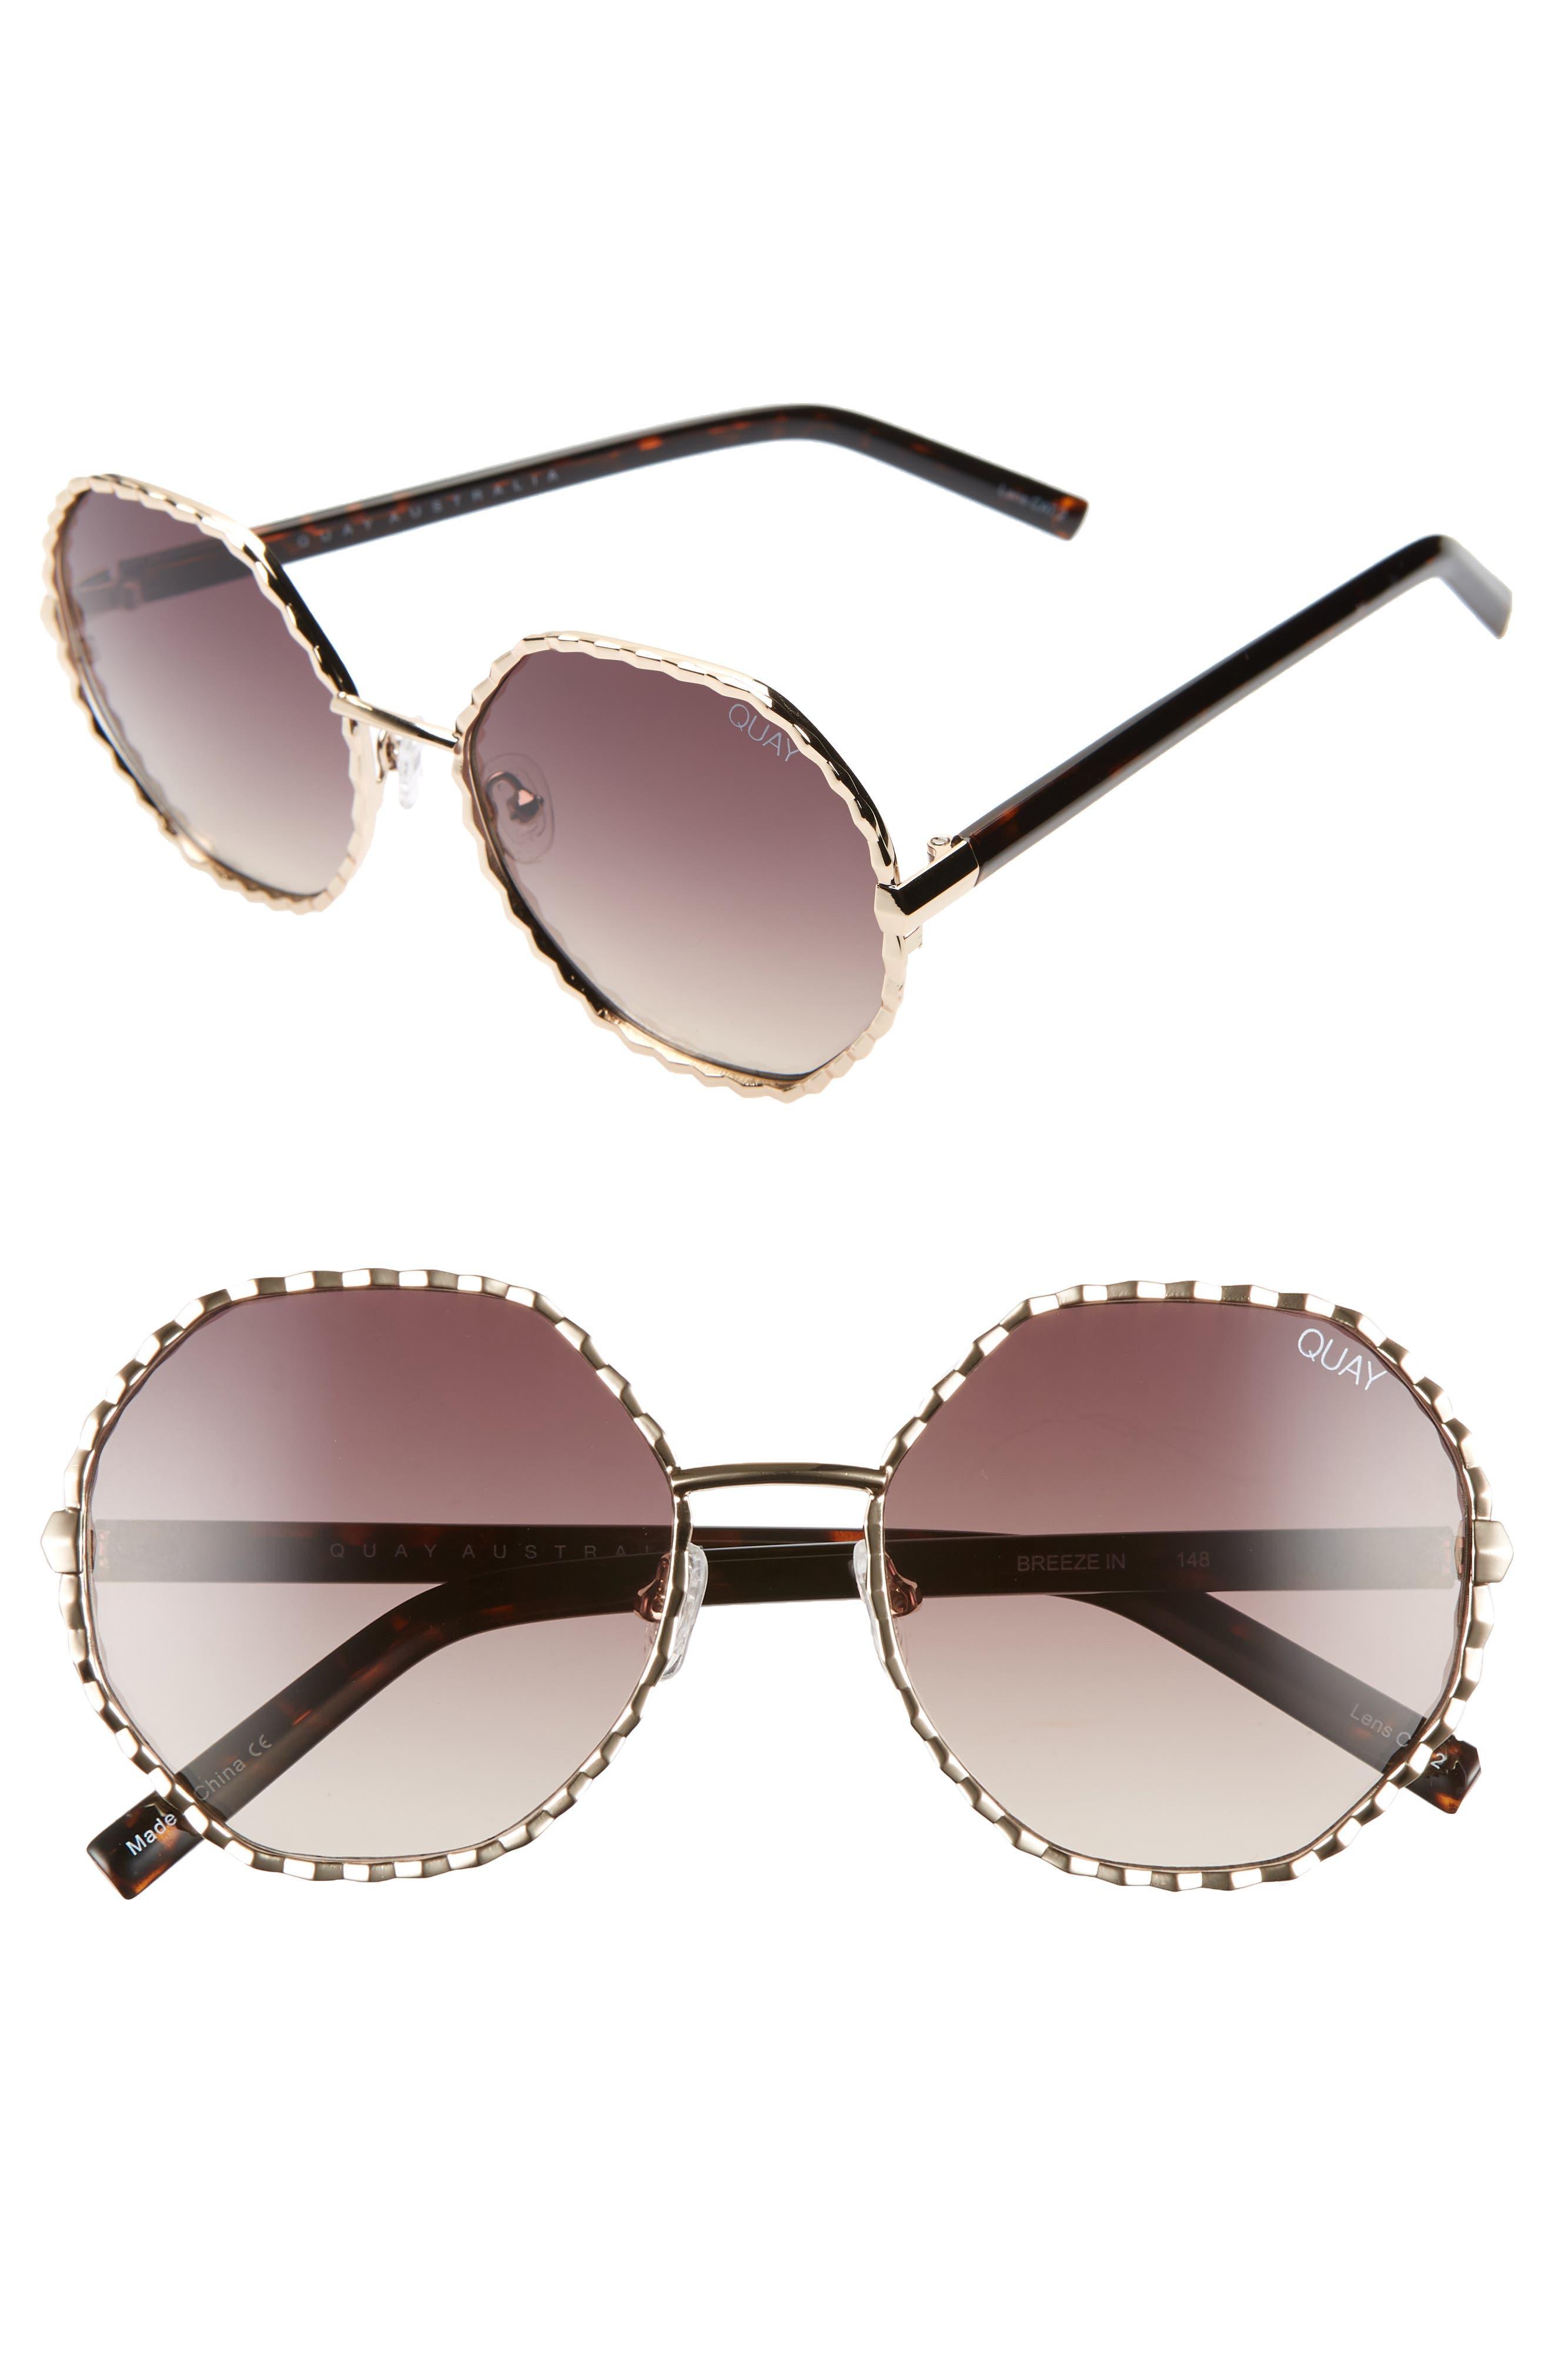 Quay Australia Breeze In 5m Round Sunglasses -